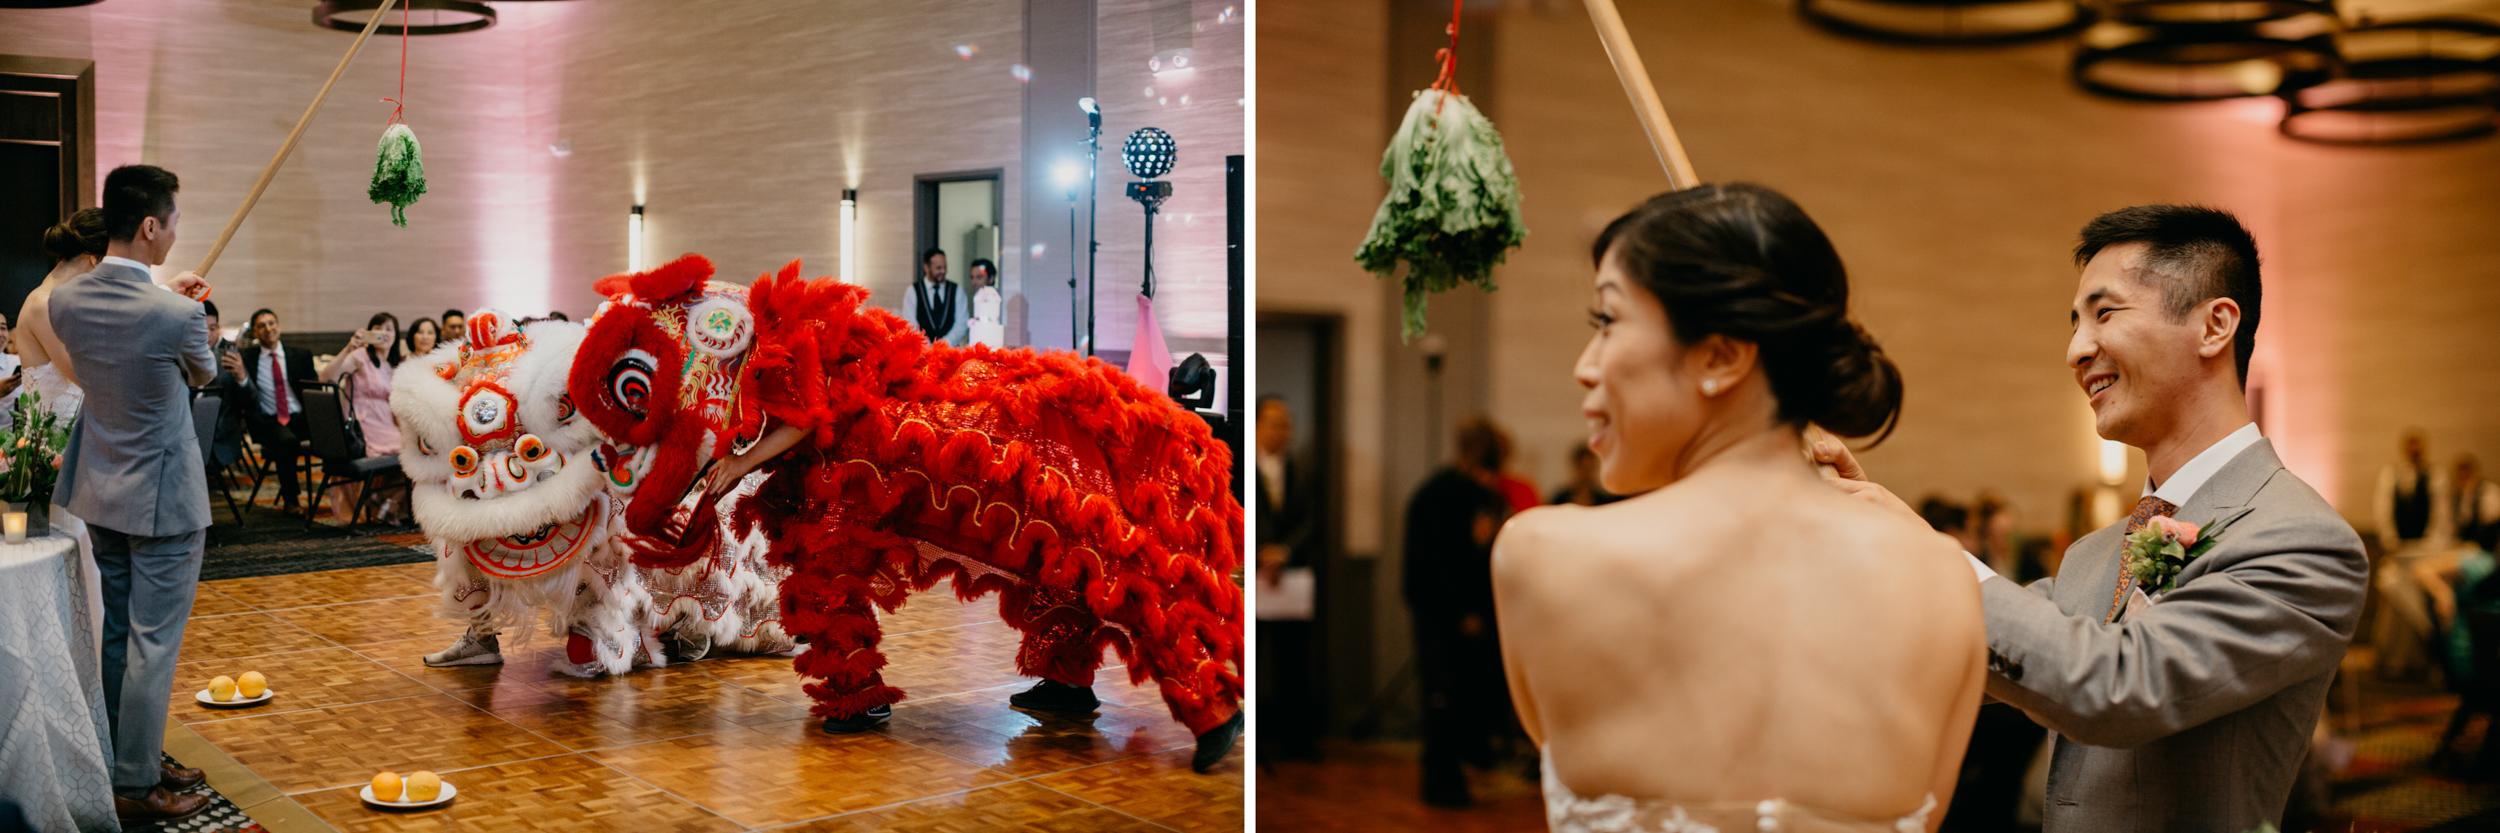 Mindy_Bo_Boston_Wedding_MIT_HotelCommonwealth_027.jpg